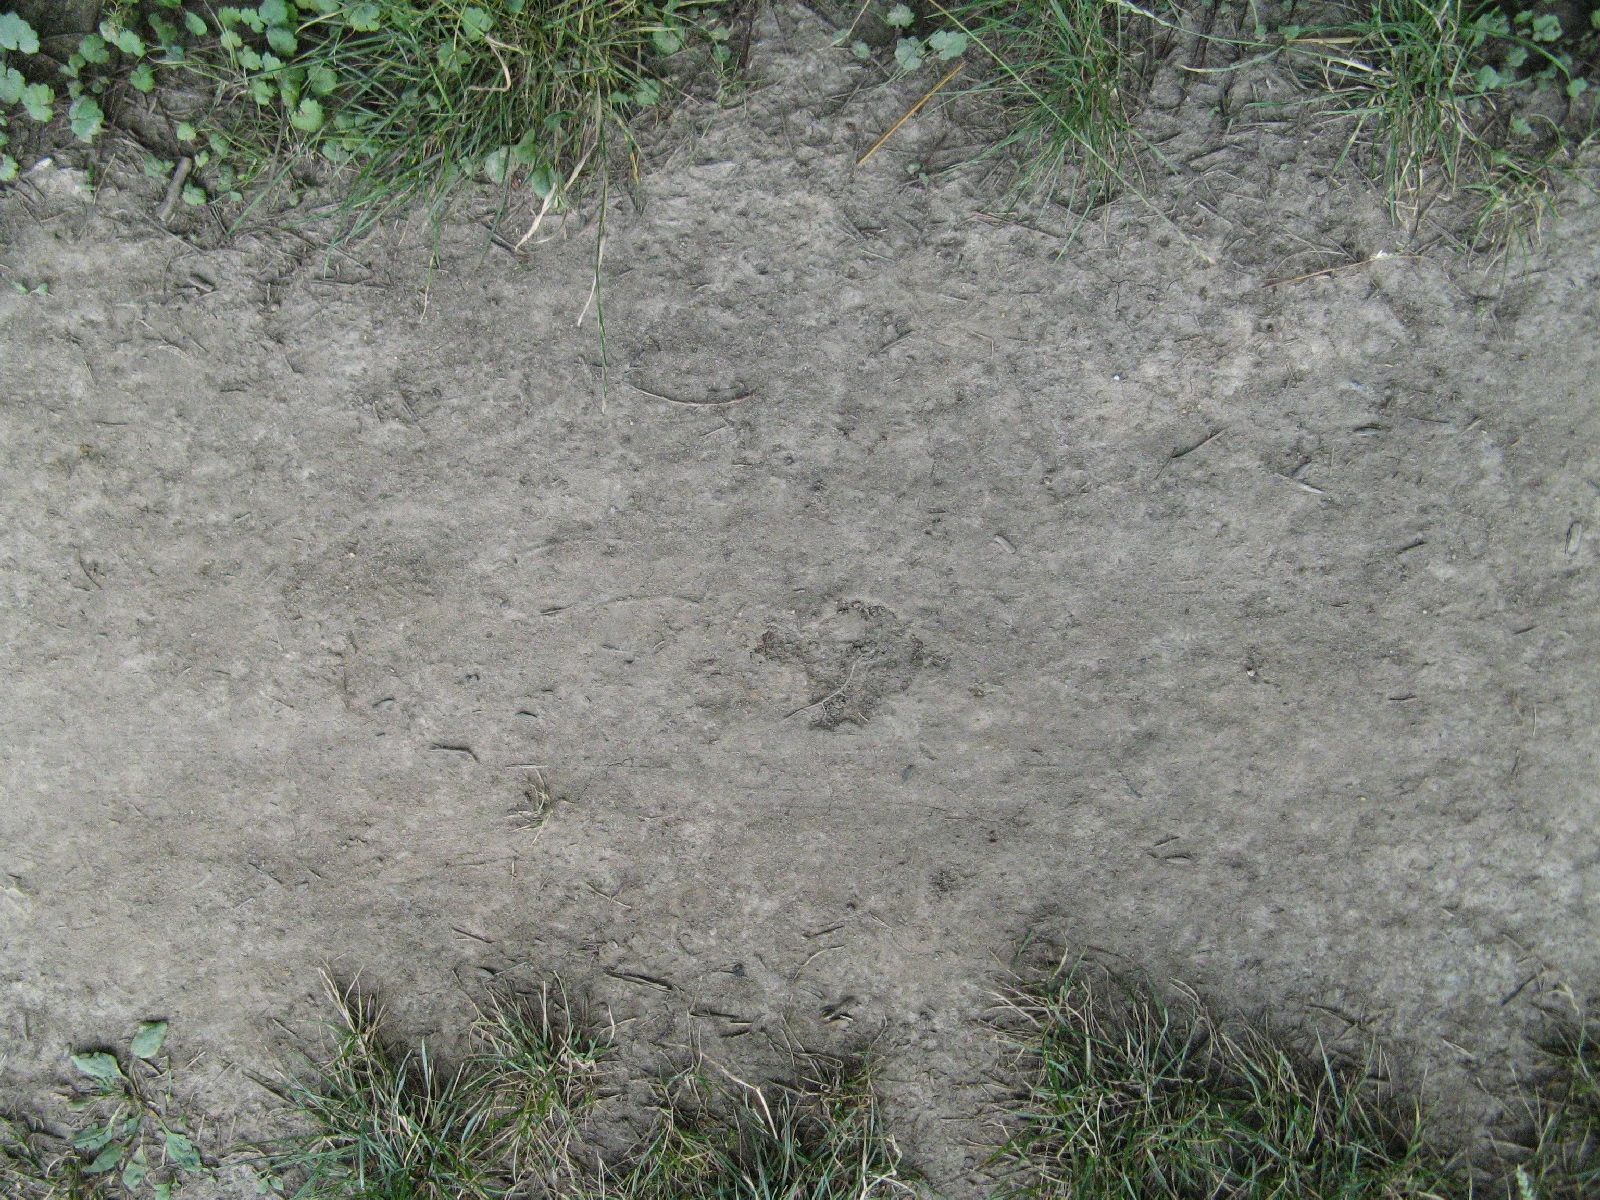 Boden-Gras-Moos-Blumen_Textur_B_00924